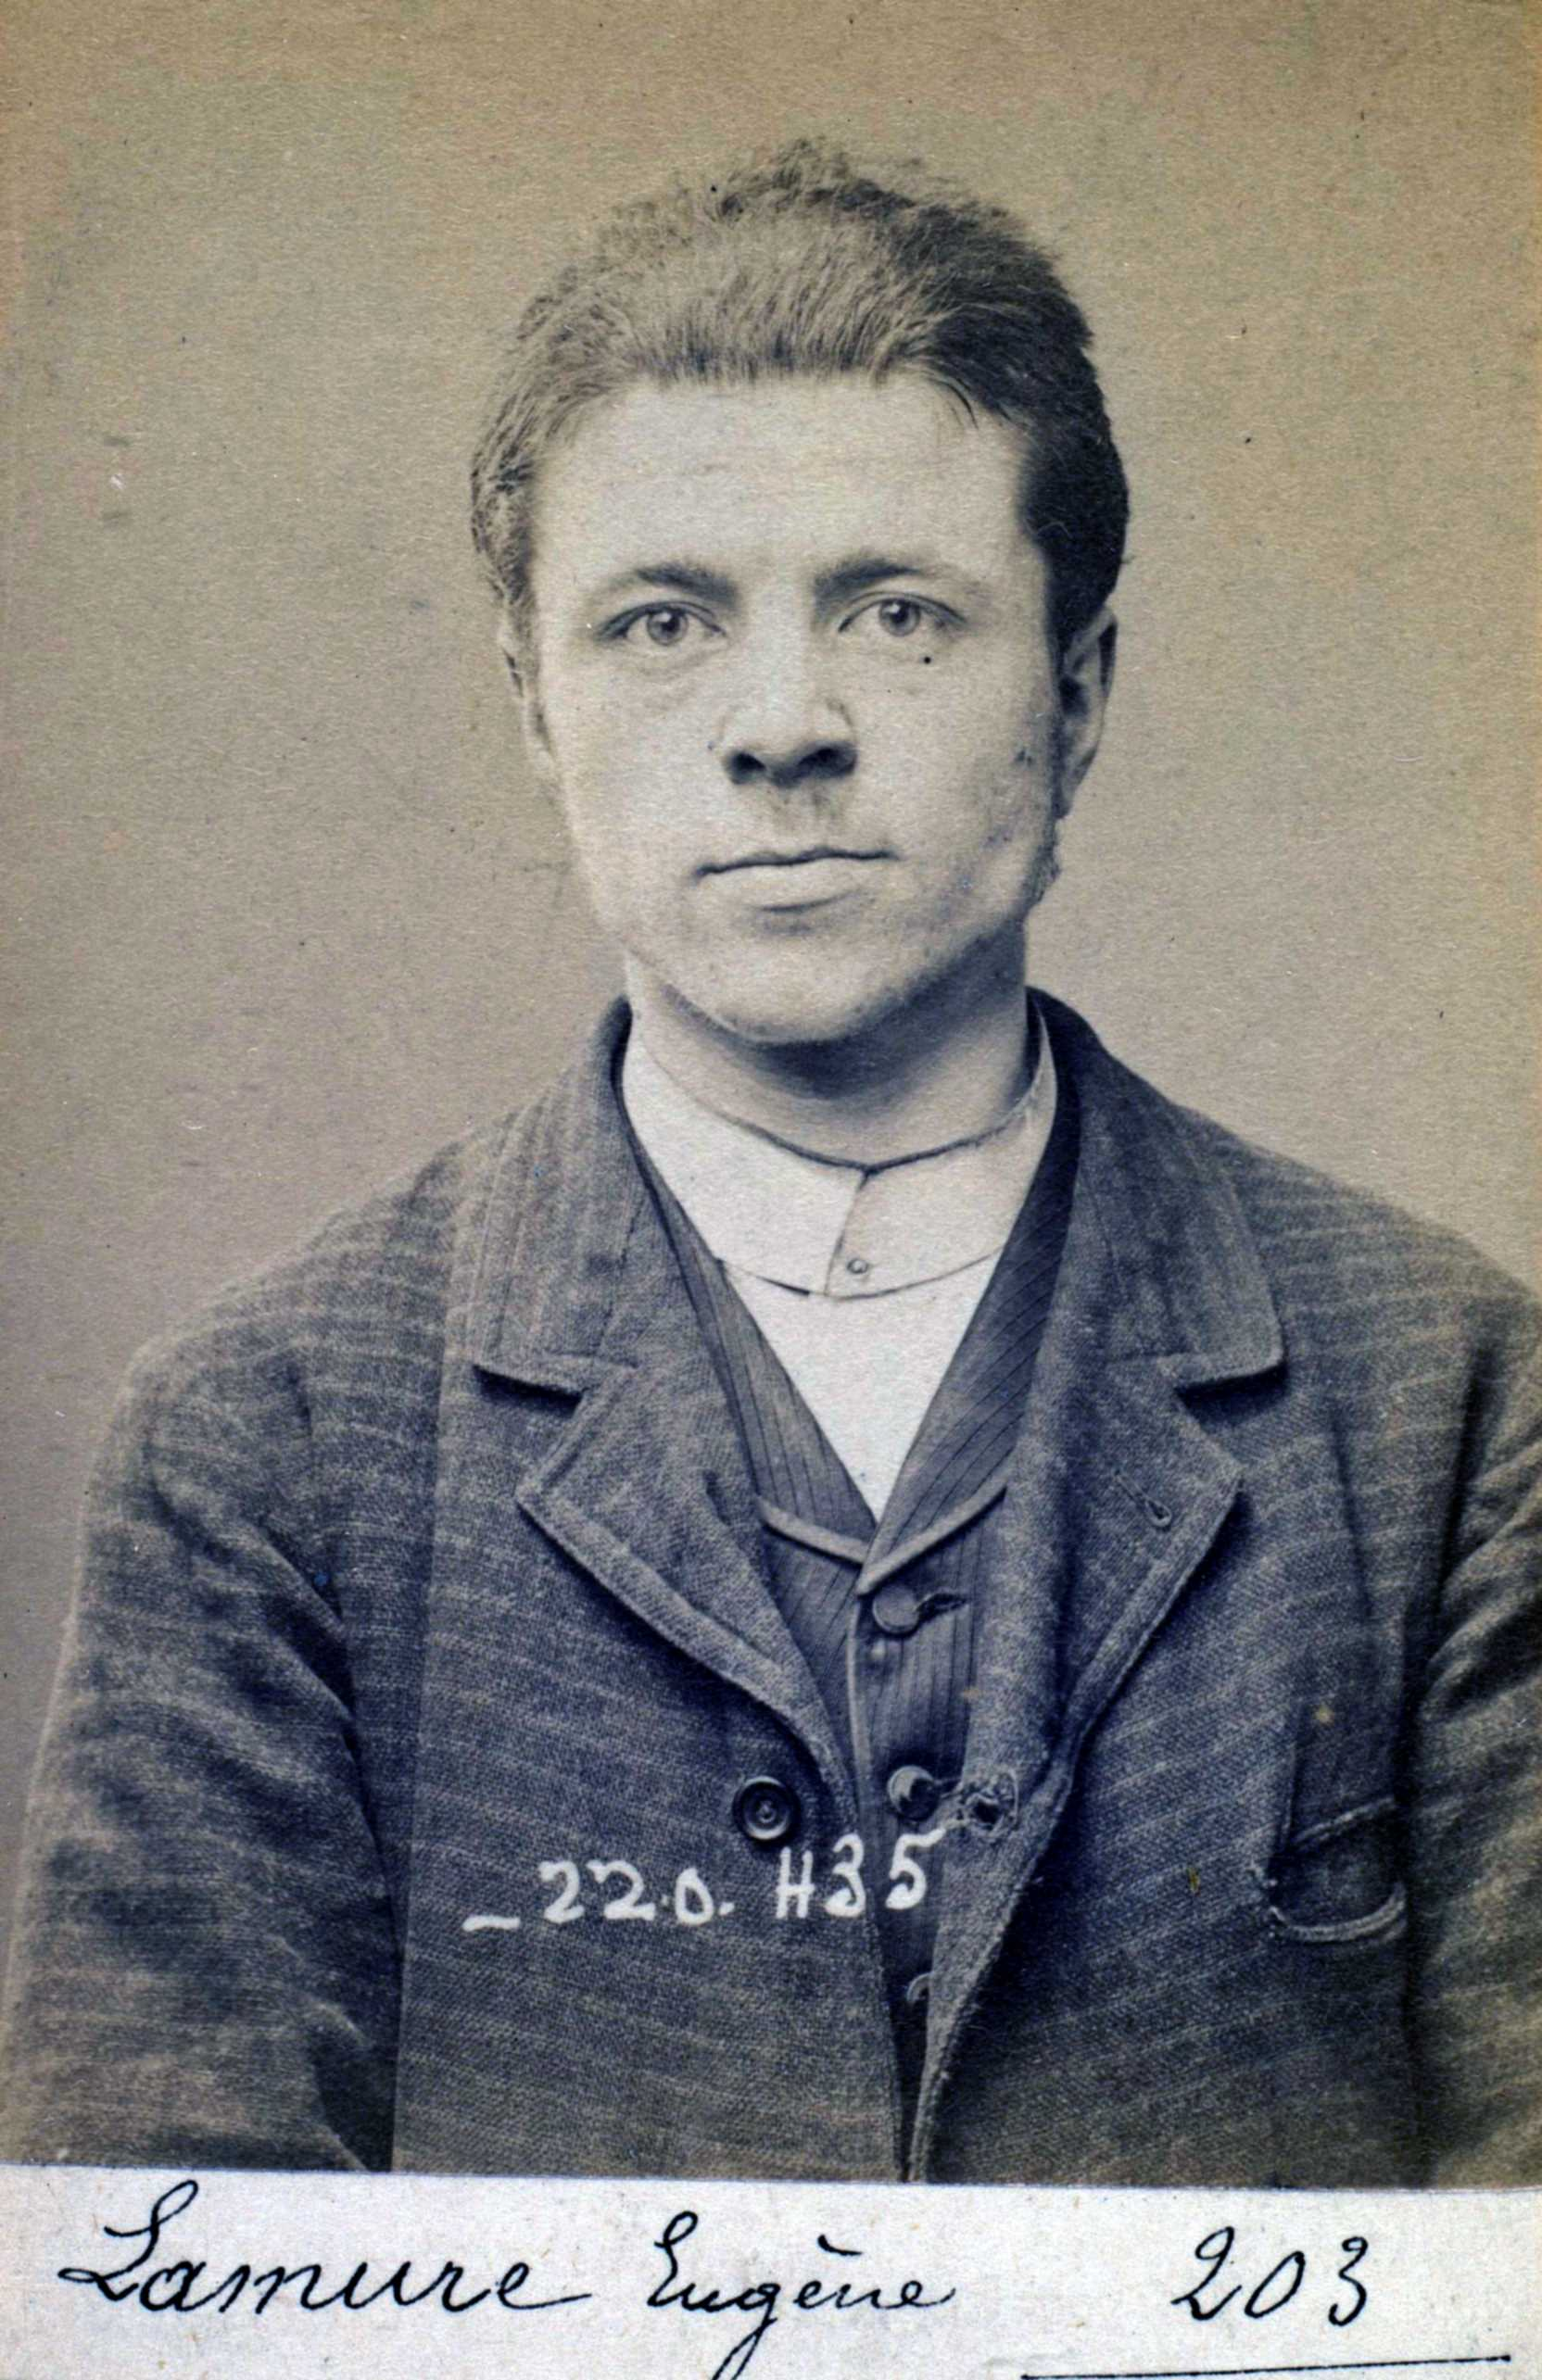 Foto policíaca d'Eugène Lamure (2 de juliol de 1894)